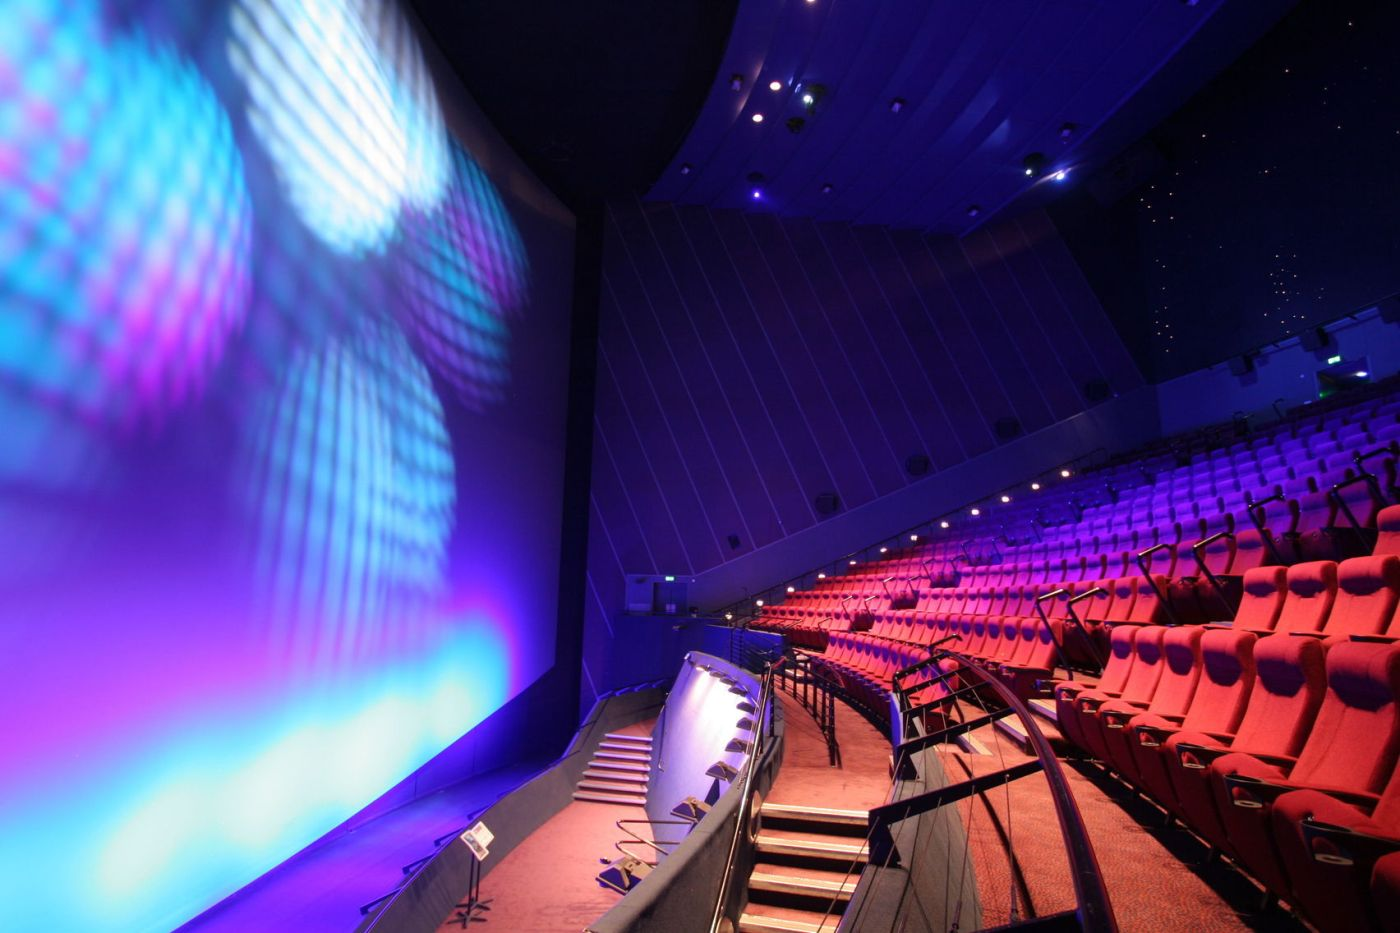 cinema hire at London's BFI IMAX